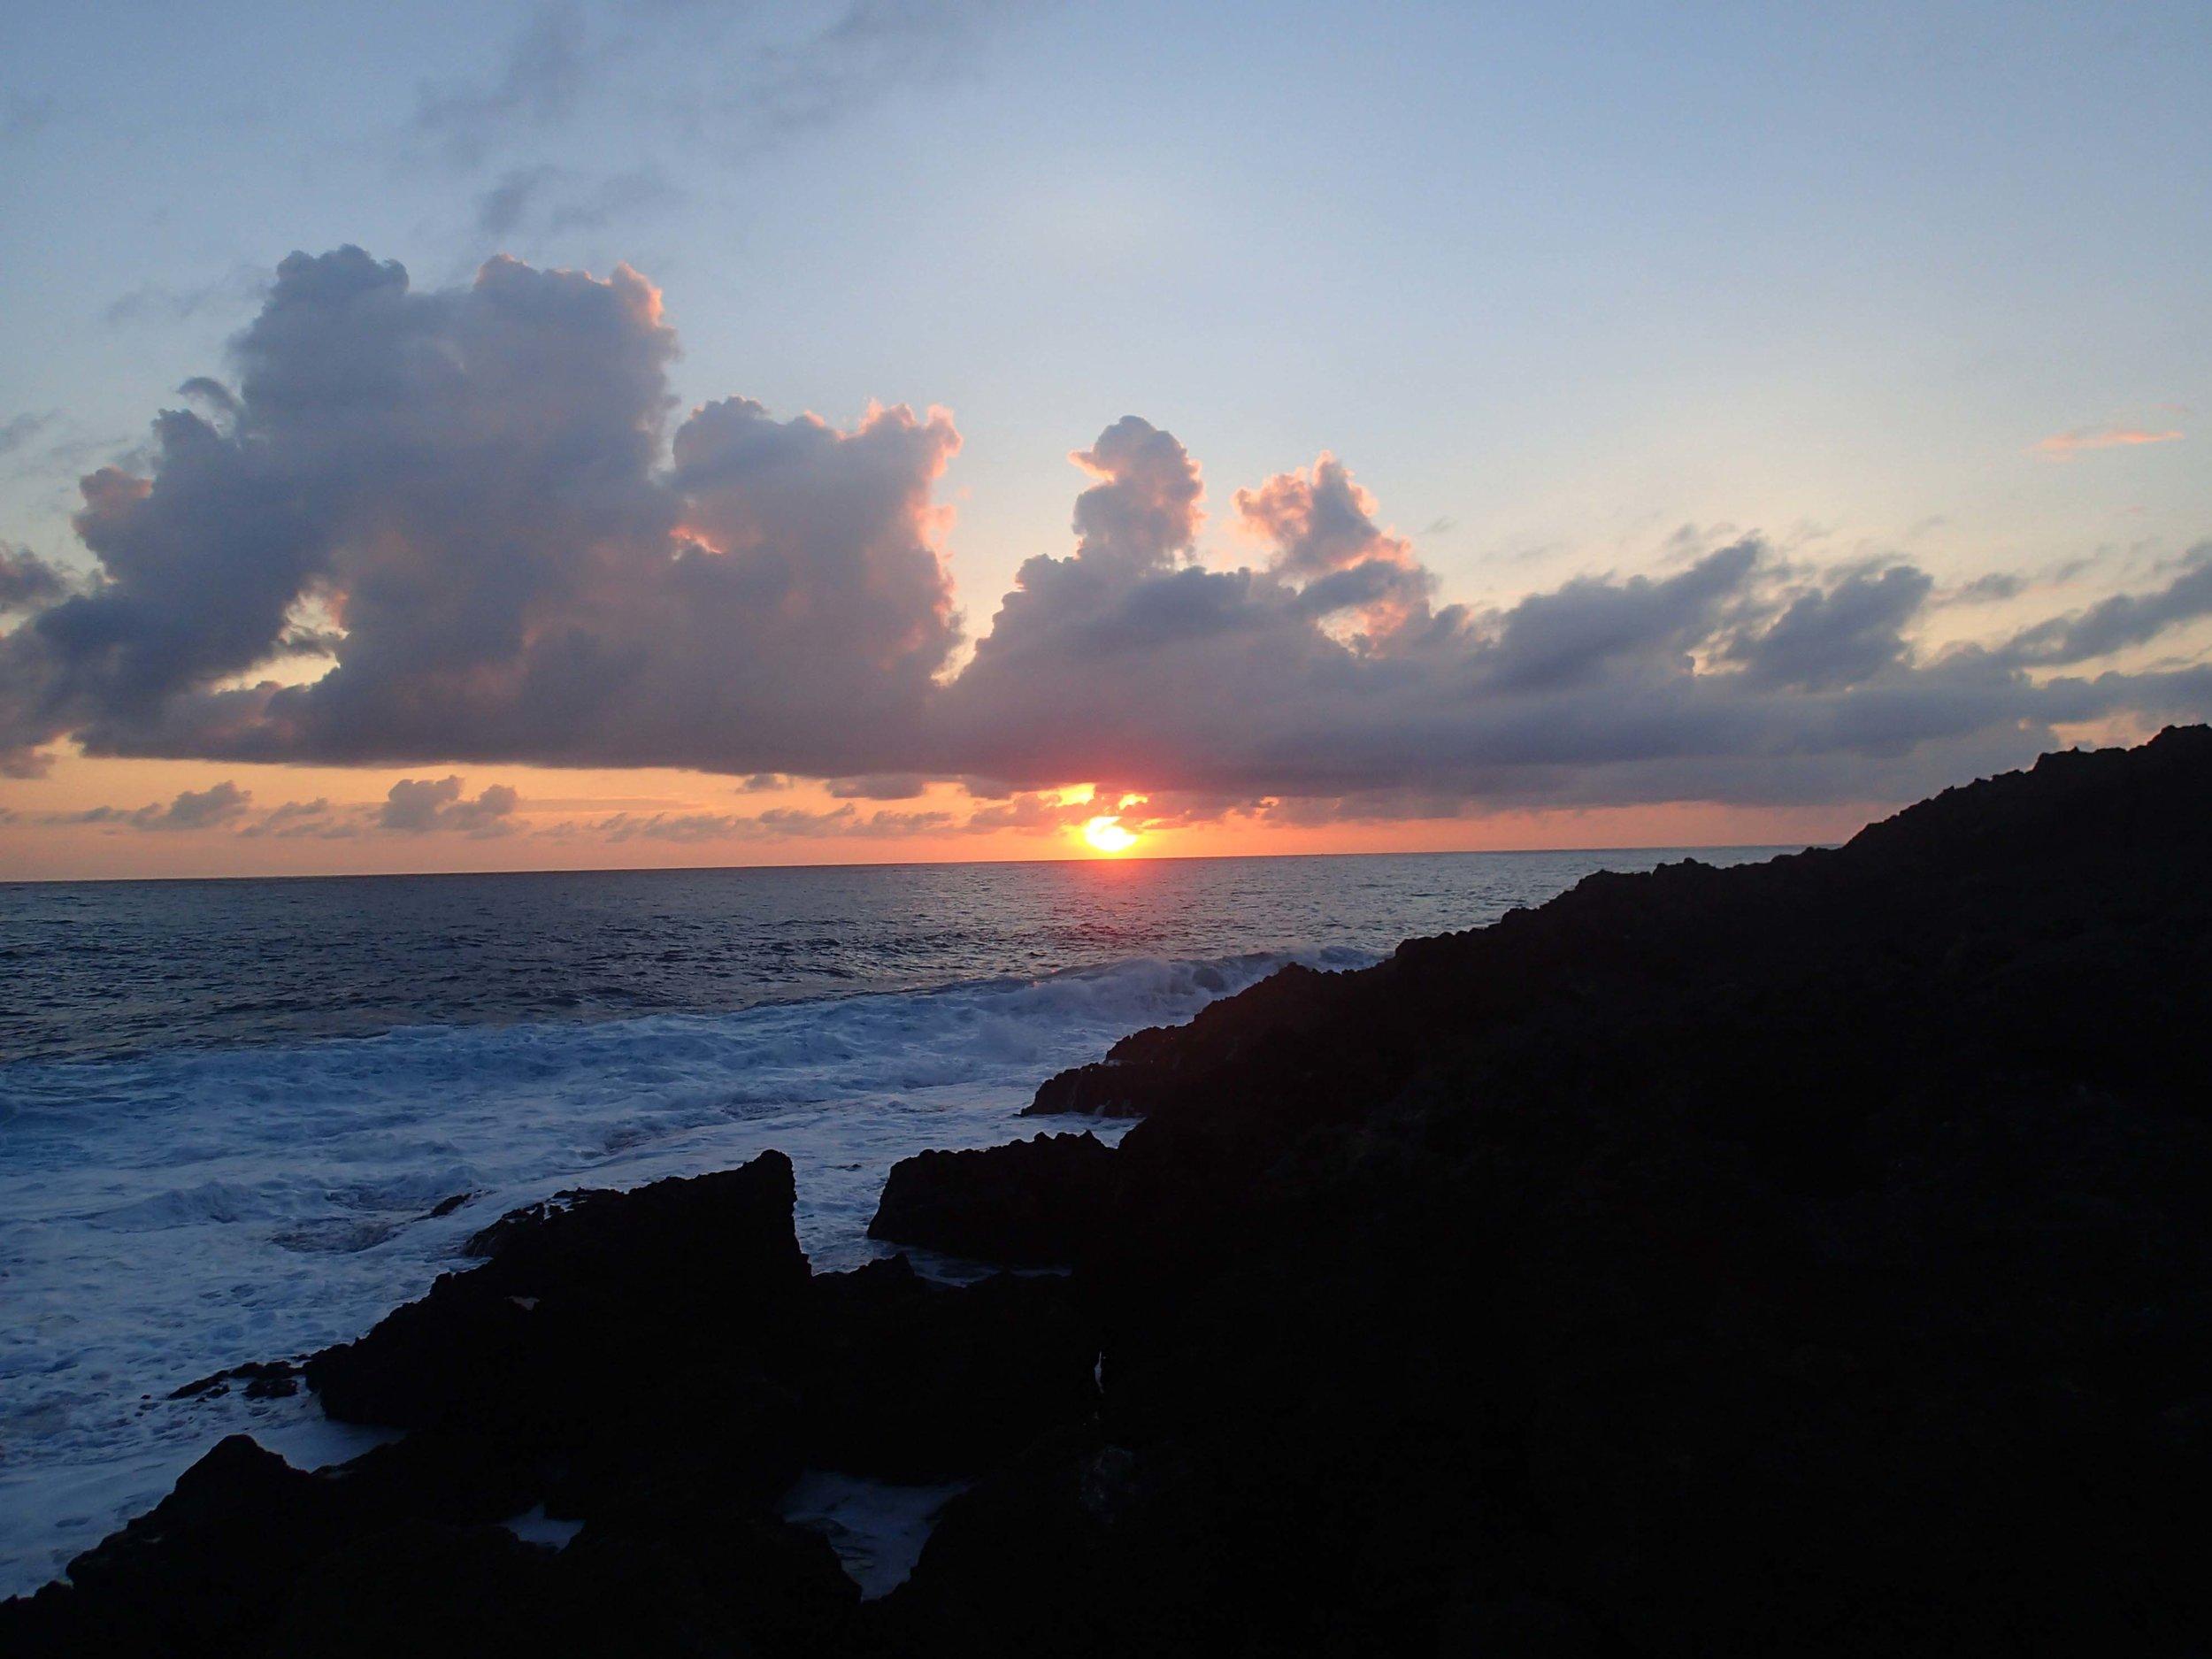 sunset 8-24-13.jpg